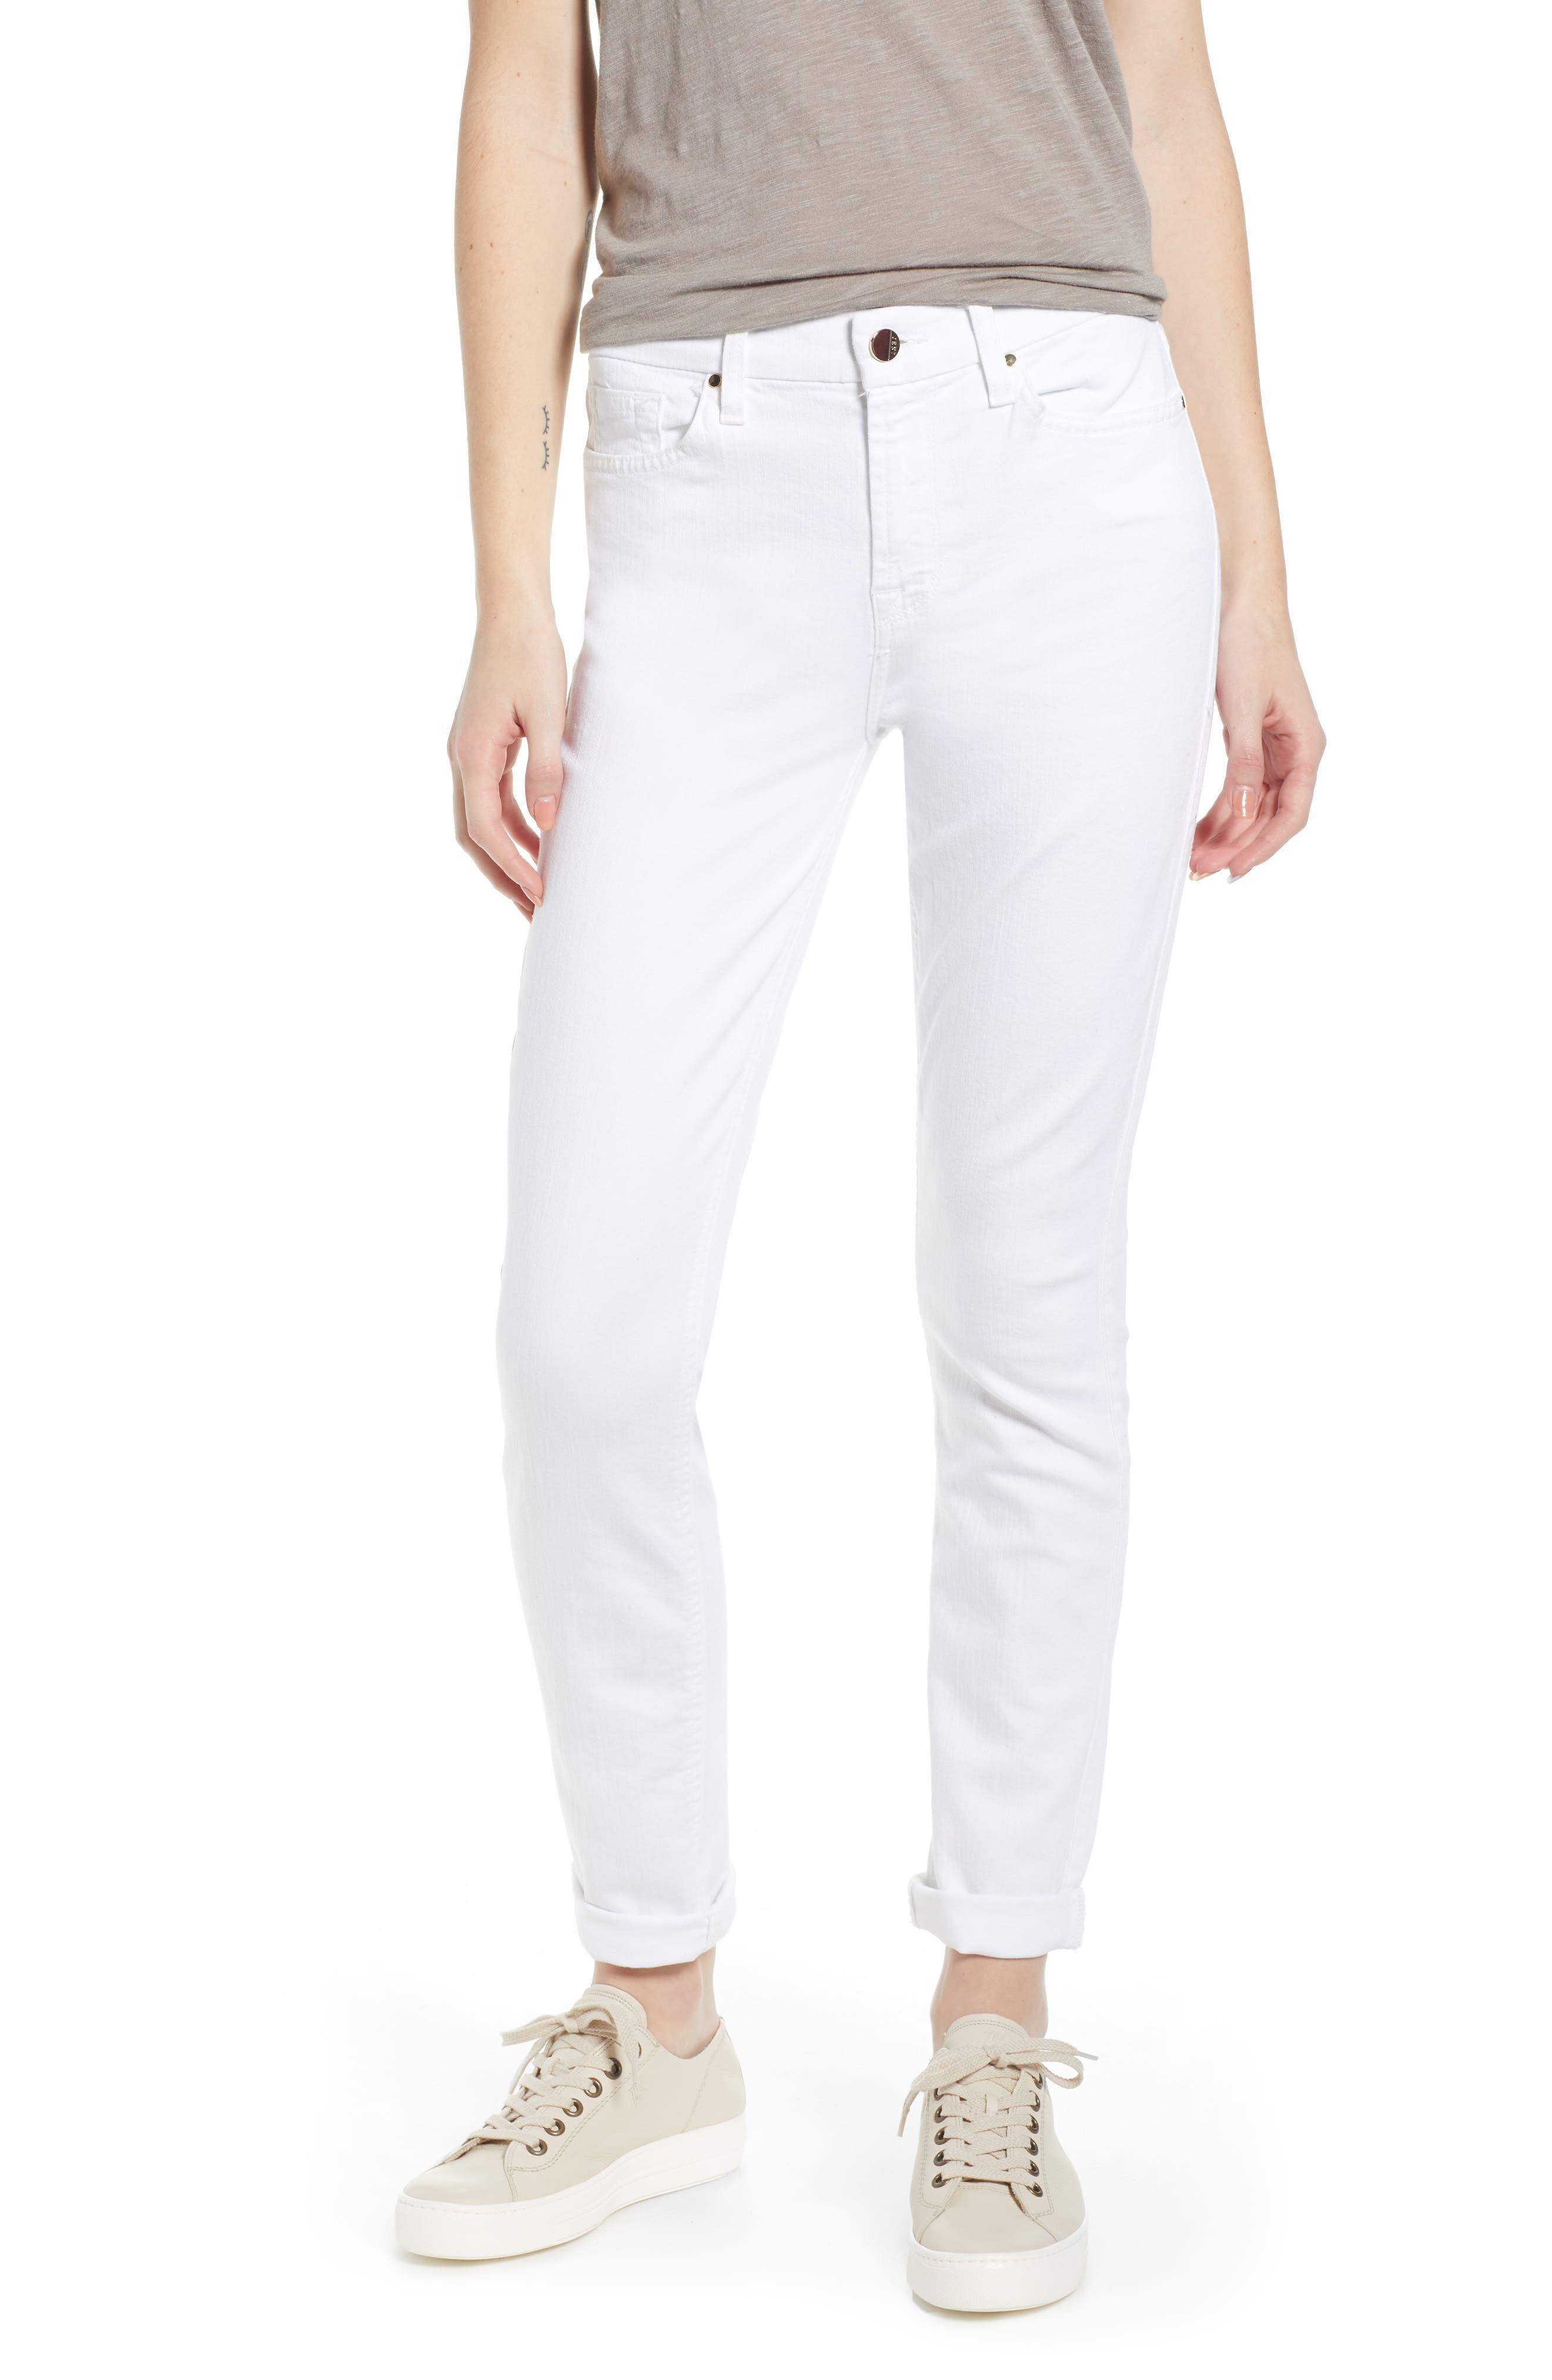 Women's Jen7 By 7 For All Mankind Stretch Skinny Jeans